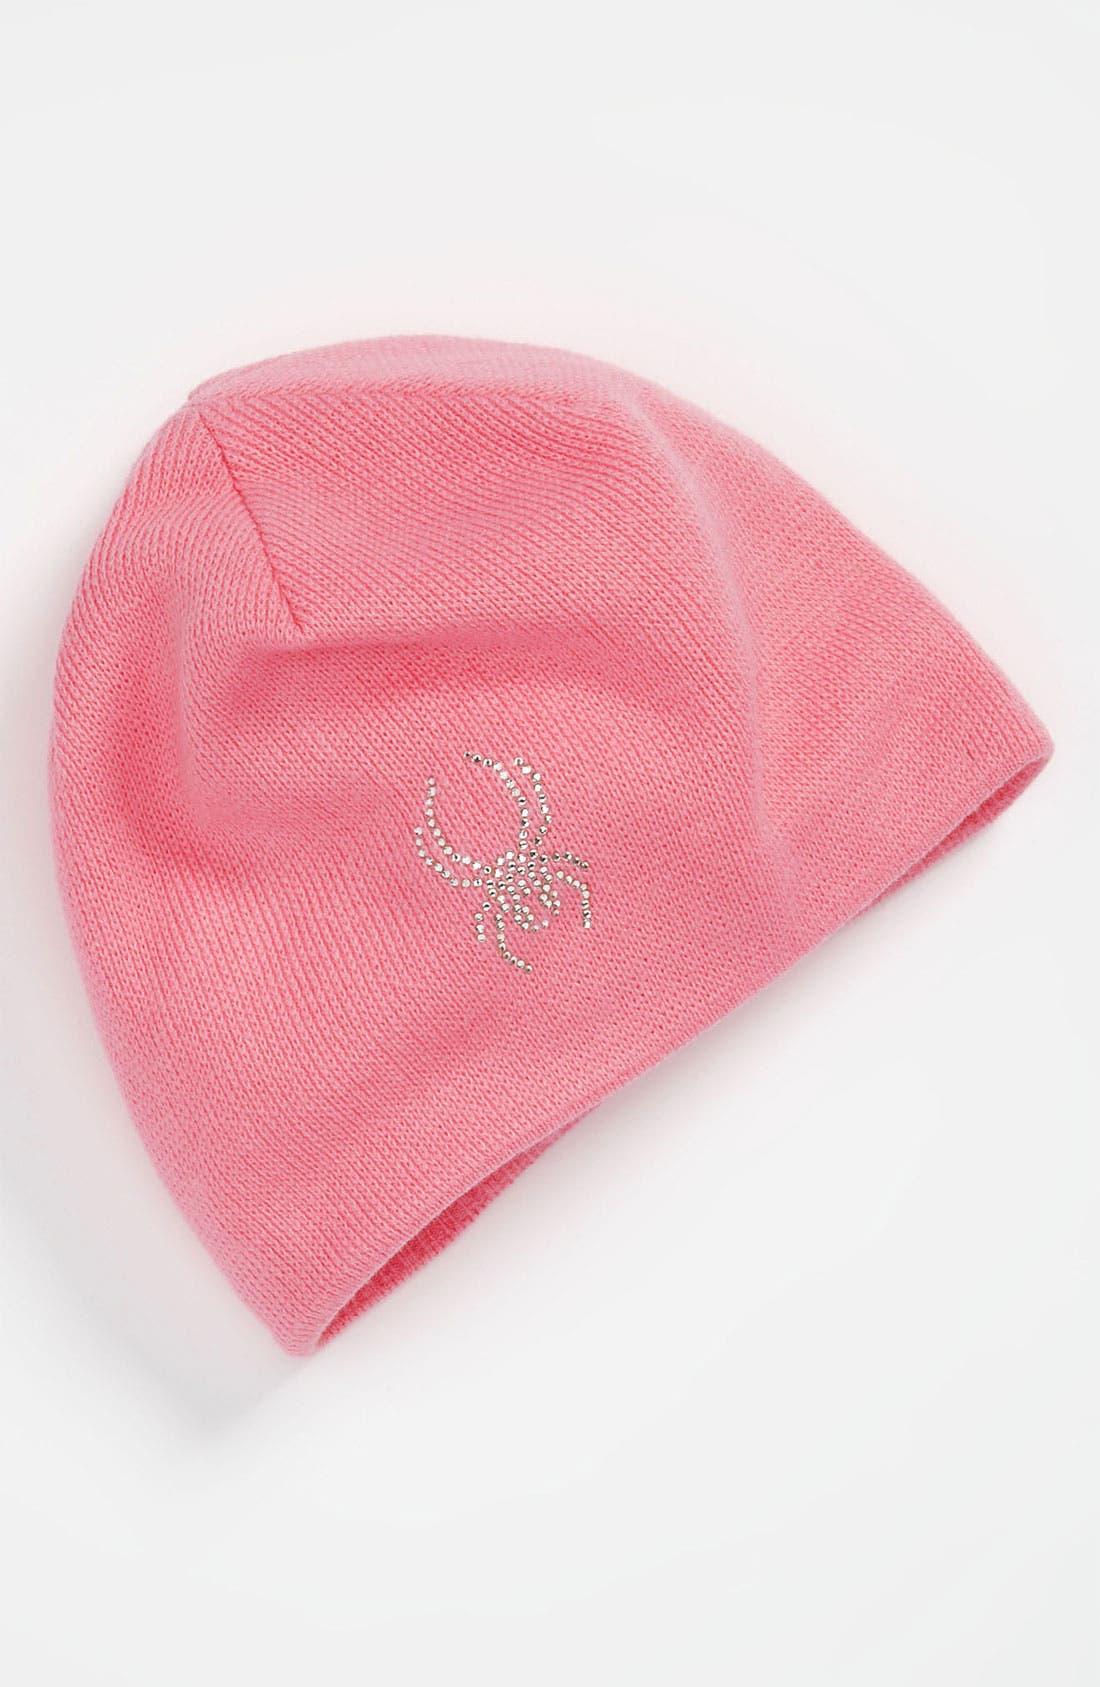 Alternate Image 1 Selected - Spyder 'Bitsy' Rhinestone Hat (Little Girls)